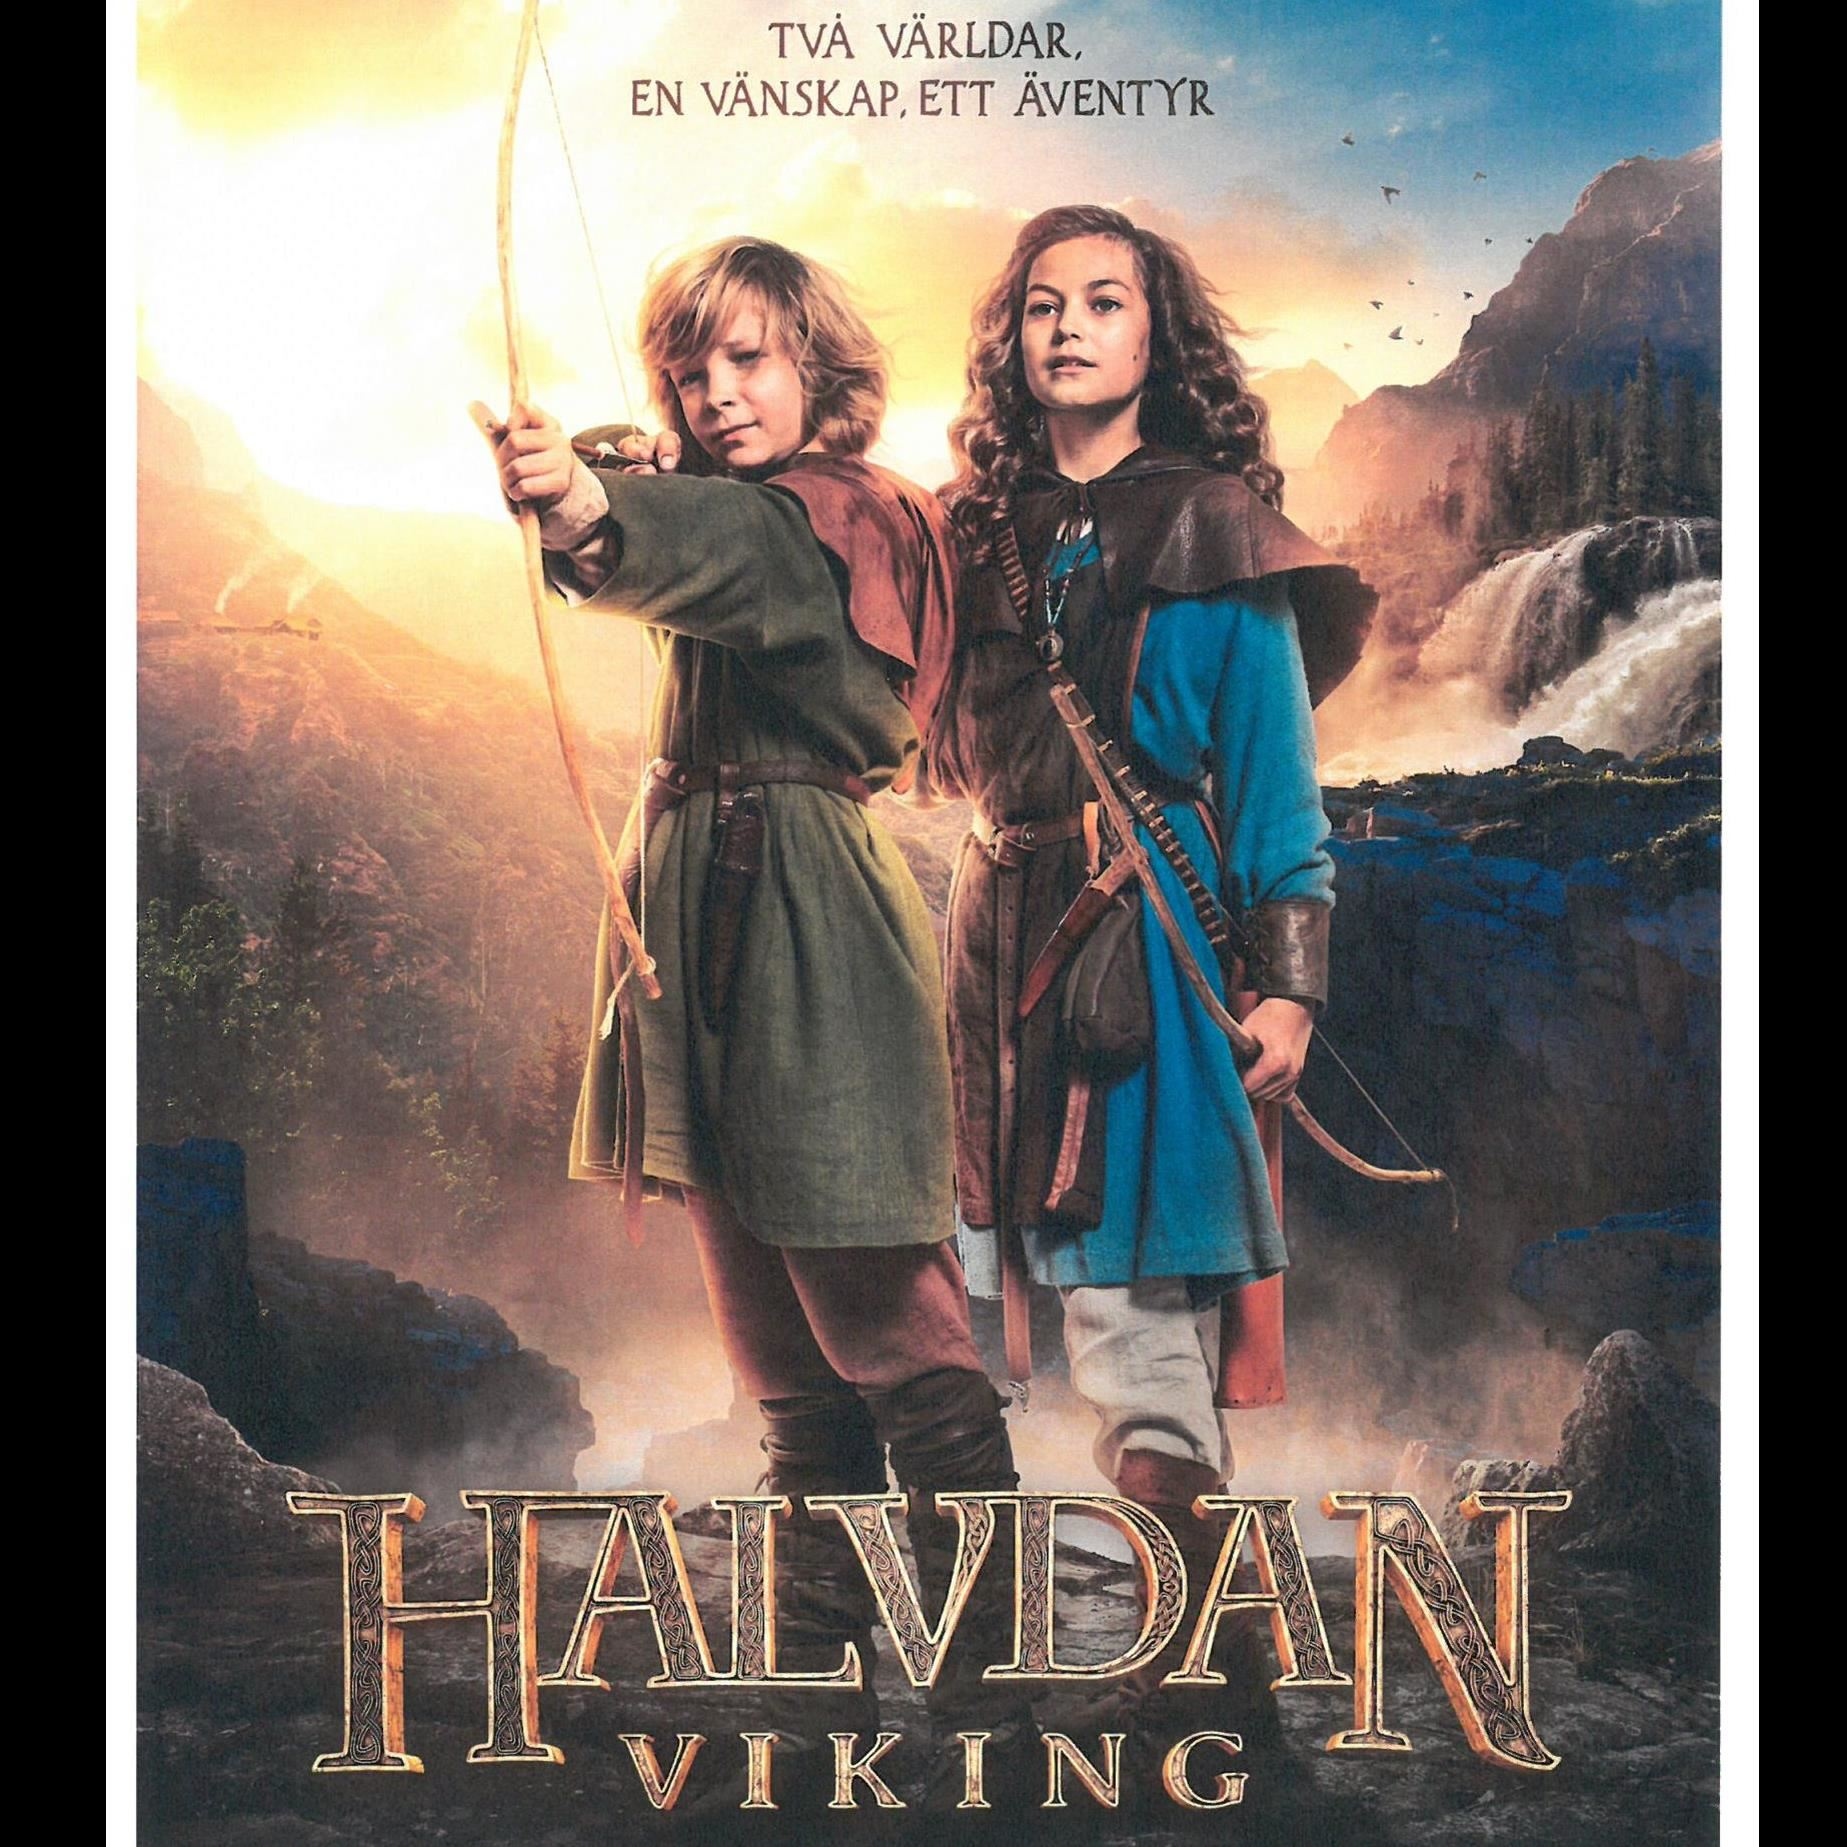 Biomatiné - Halvdan Viking (Sv.tal)